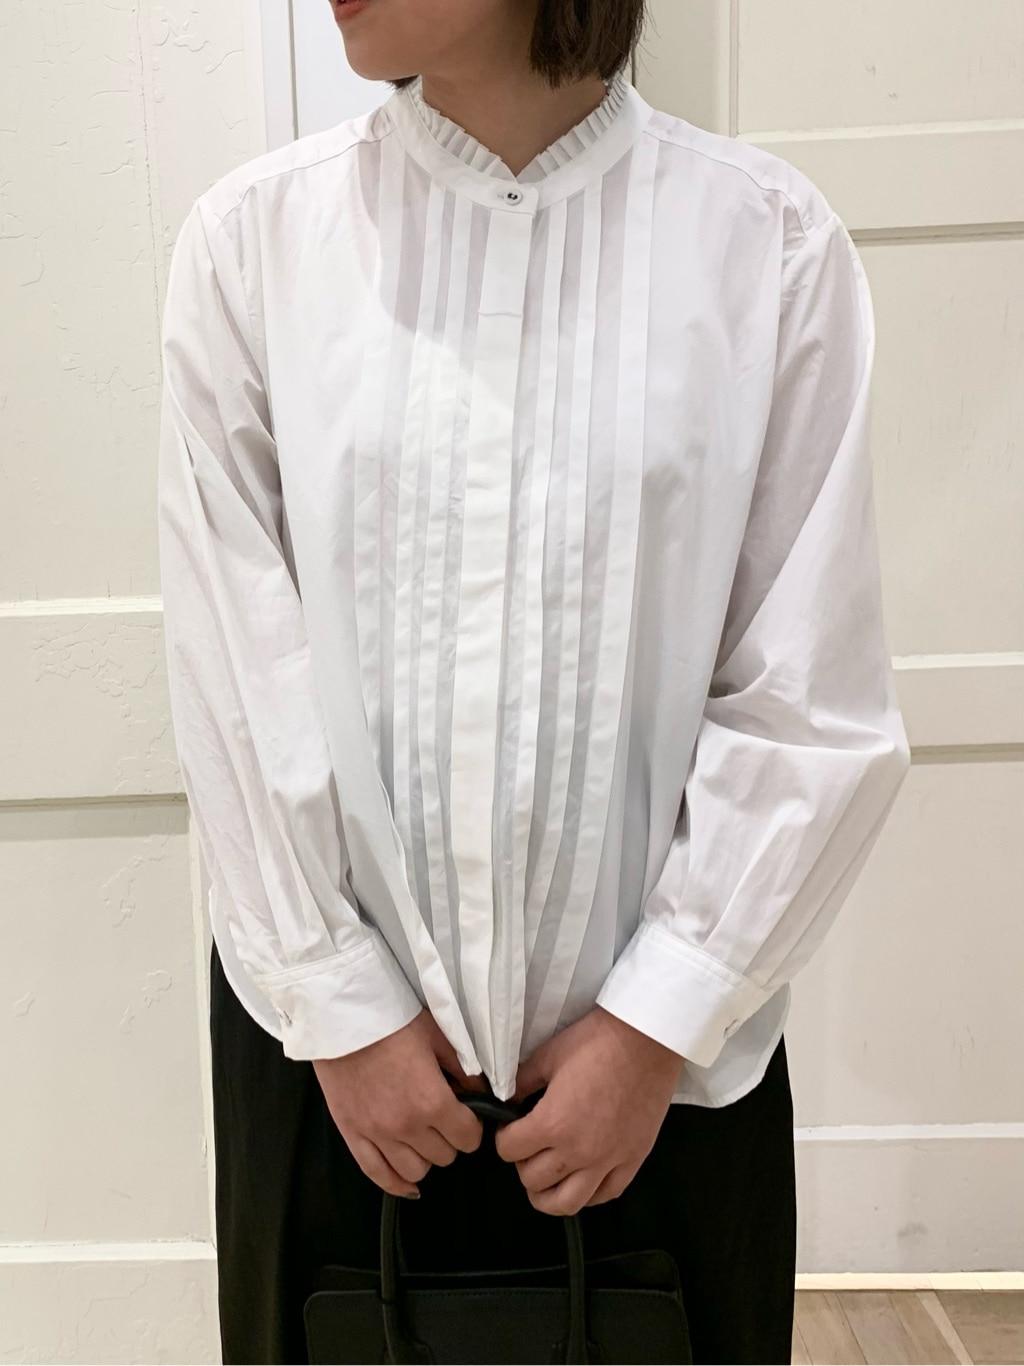 bulle de savon トリエ京王調布 身長:159cm 2020.12.09